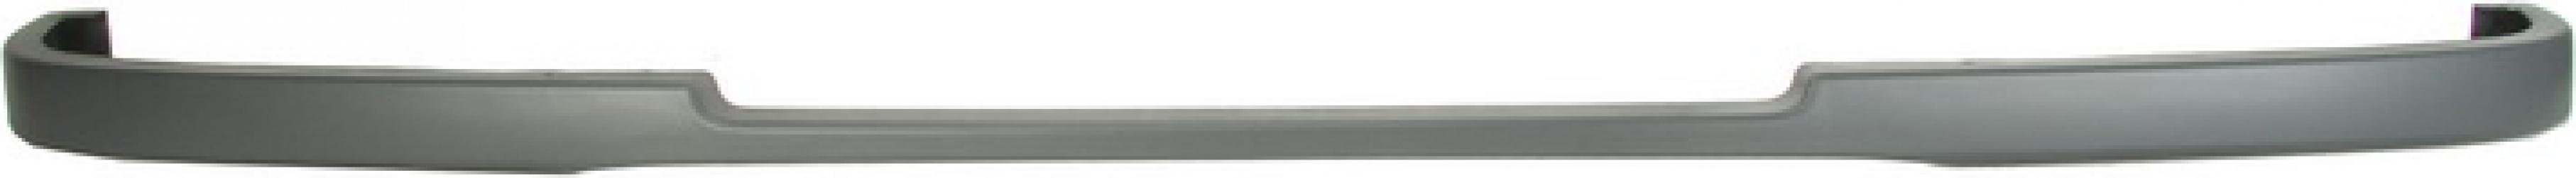 Bara fata inferior plastic DAF LF Elemente caroserie